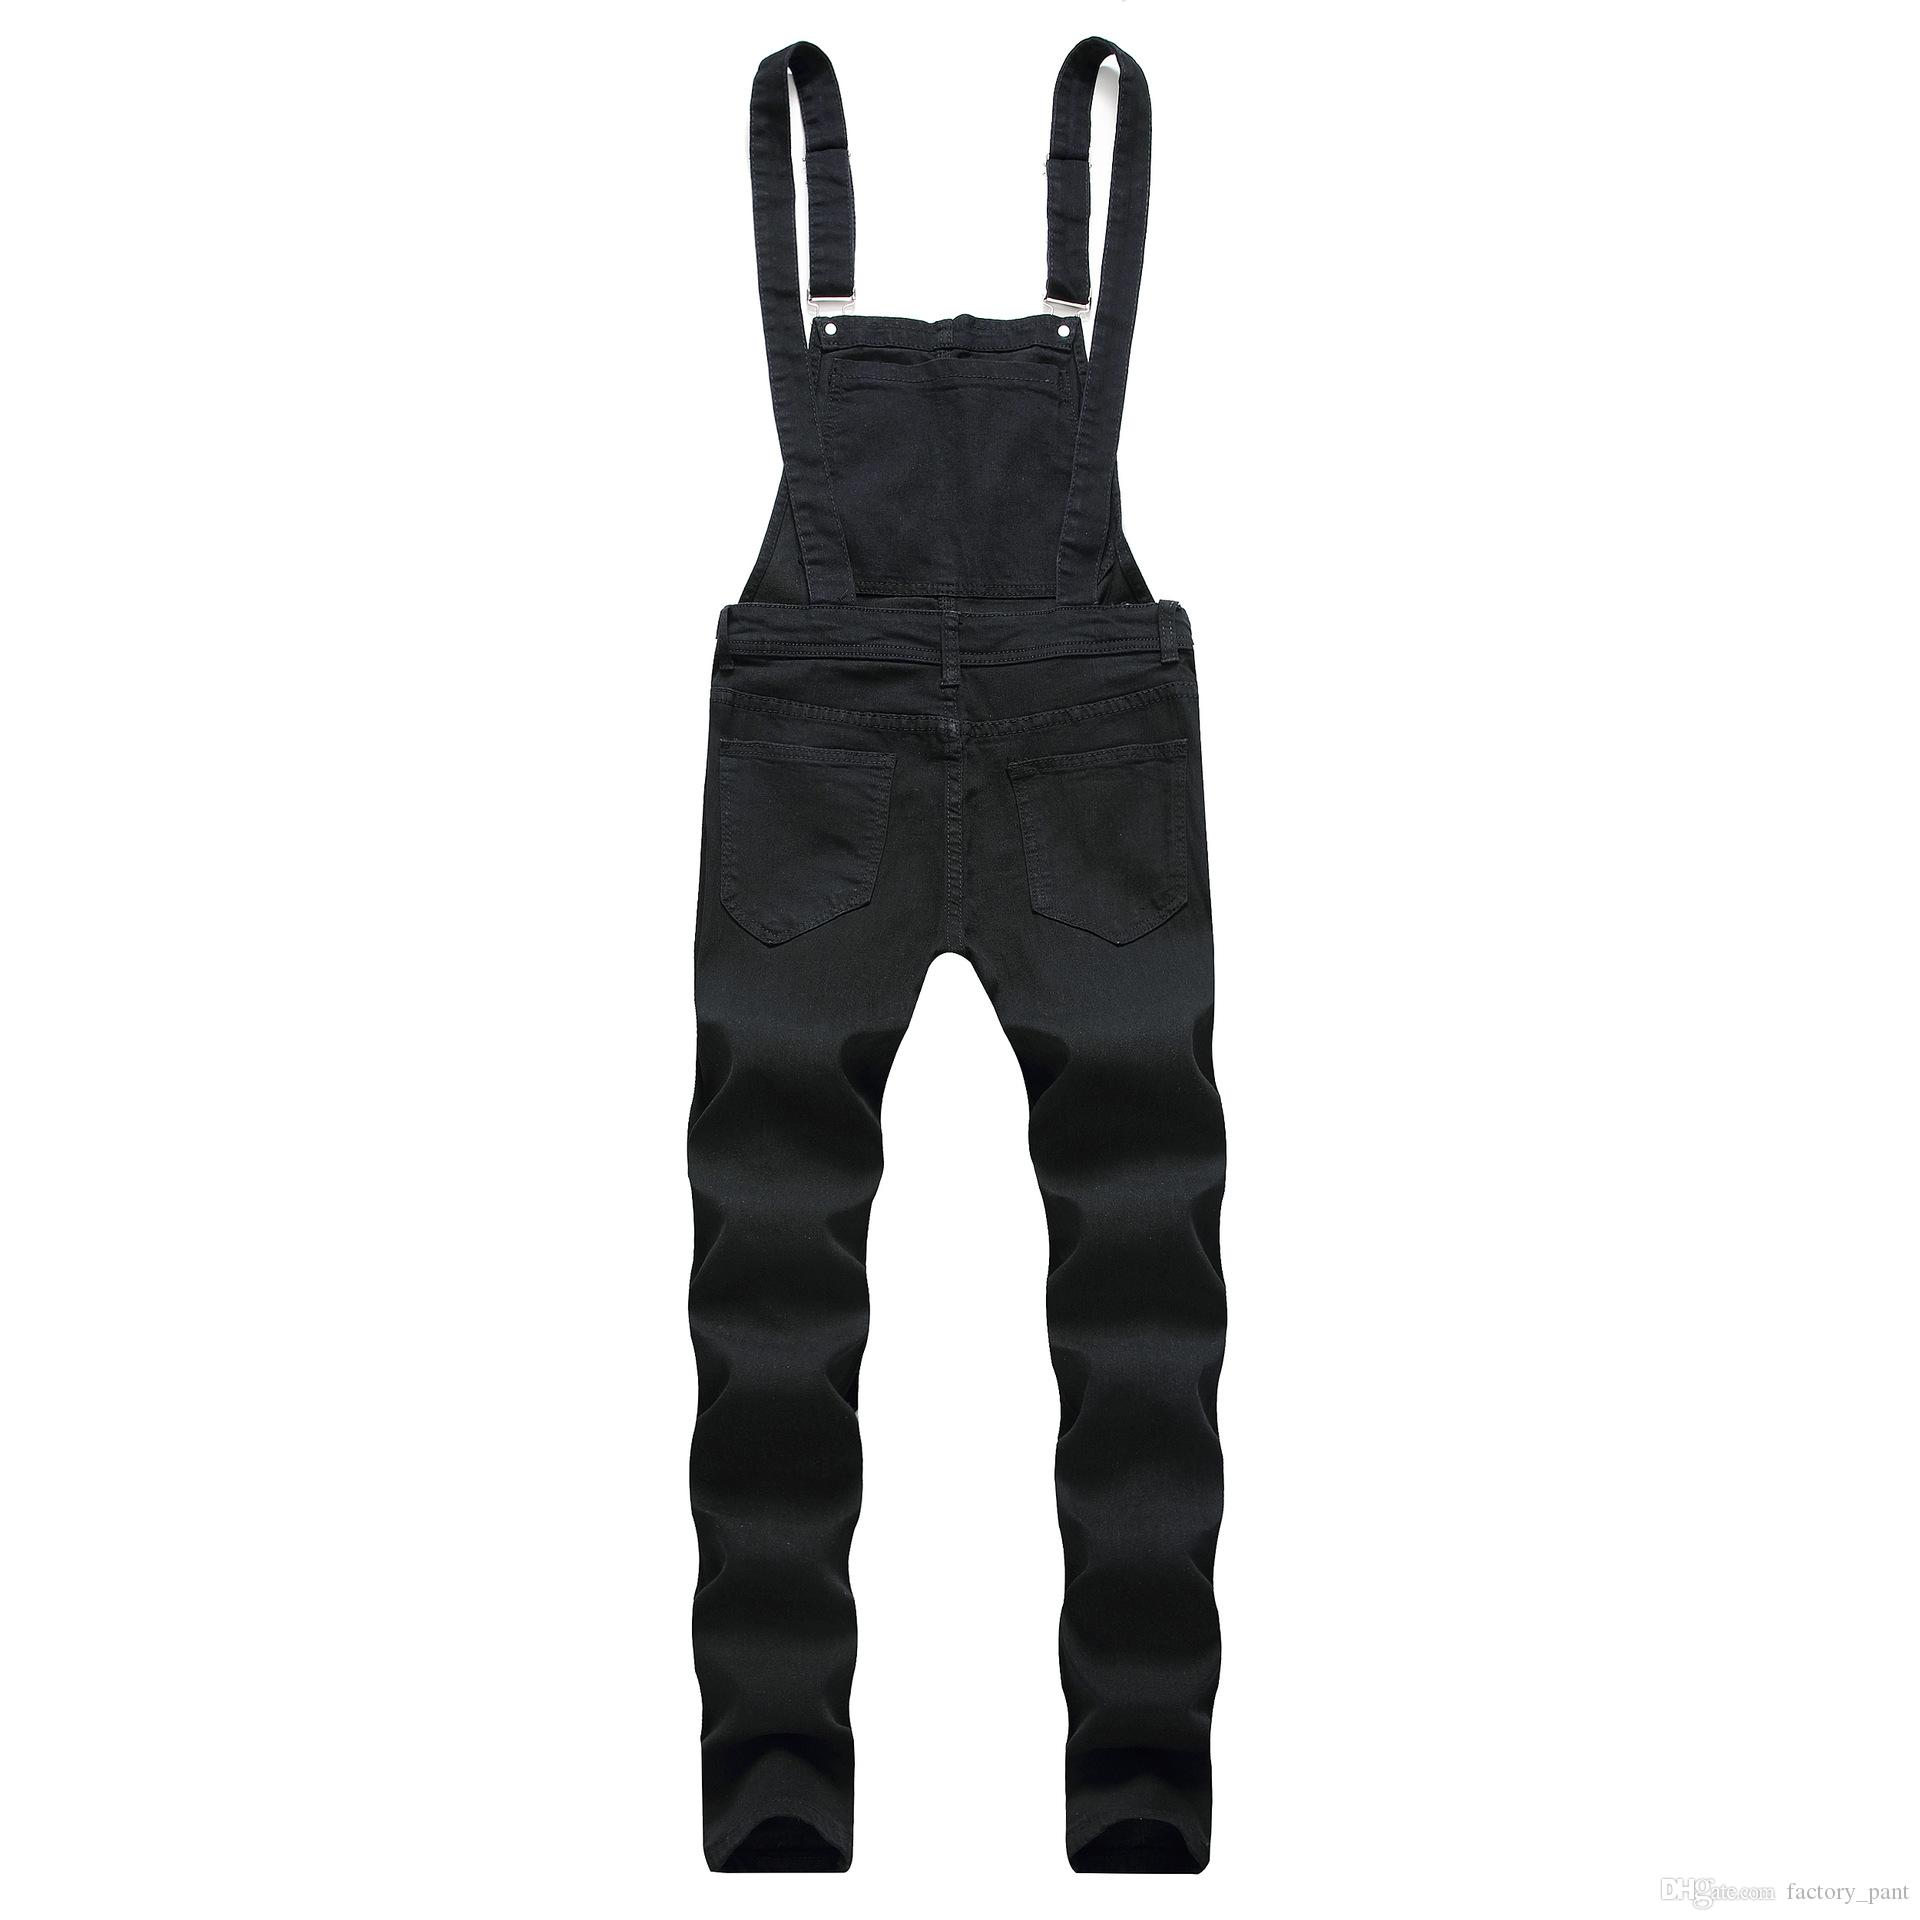 2019 Oversize Fashion Men's Ripped Jeans Jumpsuits Summer Hi Street Distressed Denim Bib Overalls For Man Suspender Pants 3XL